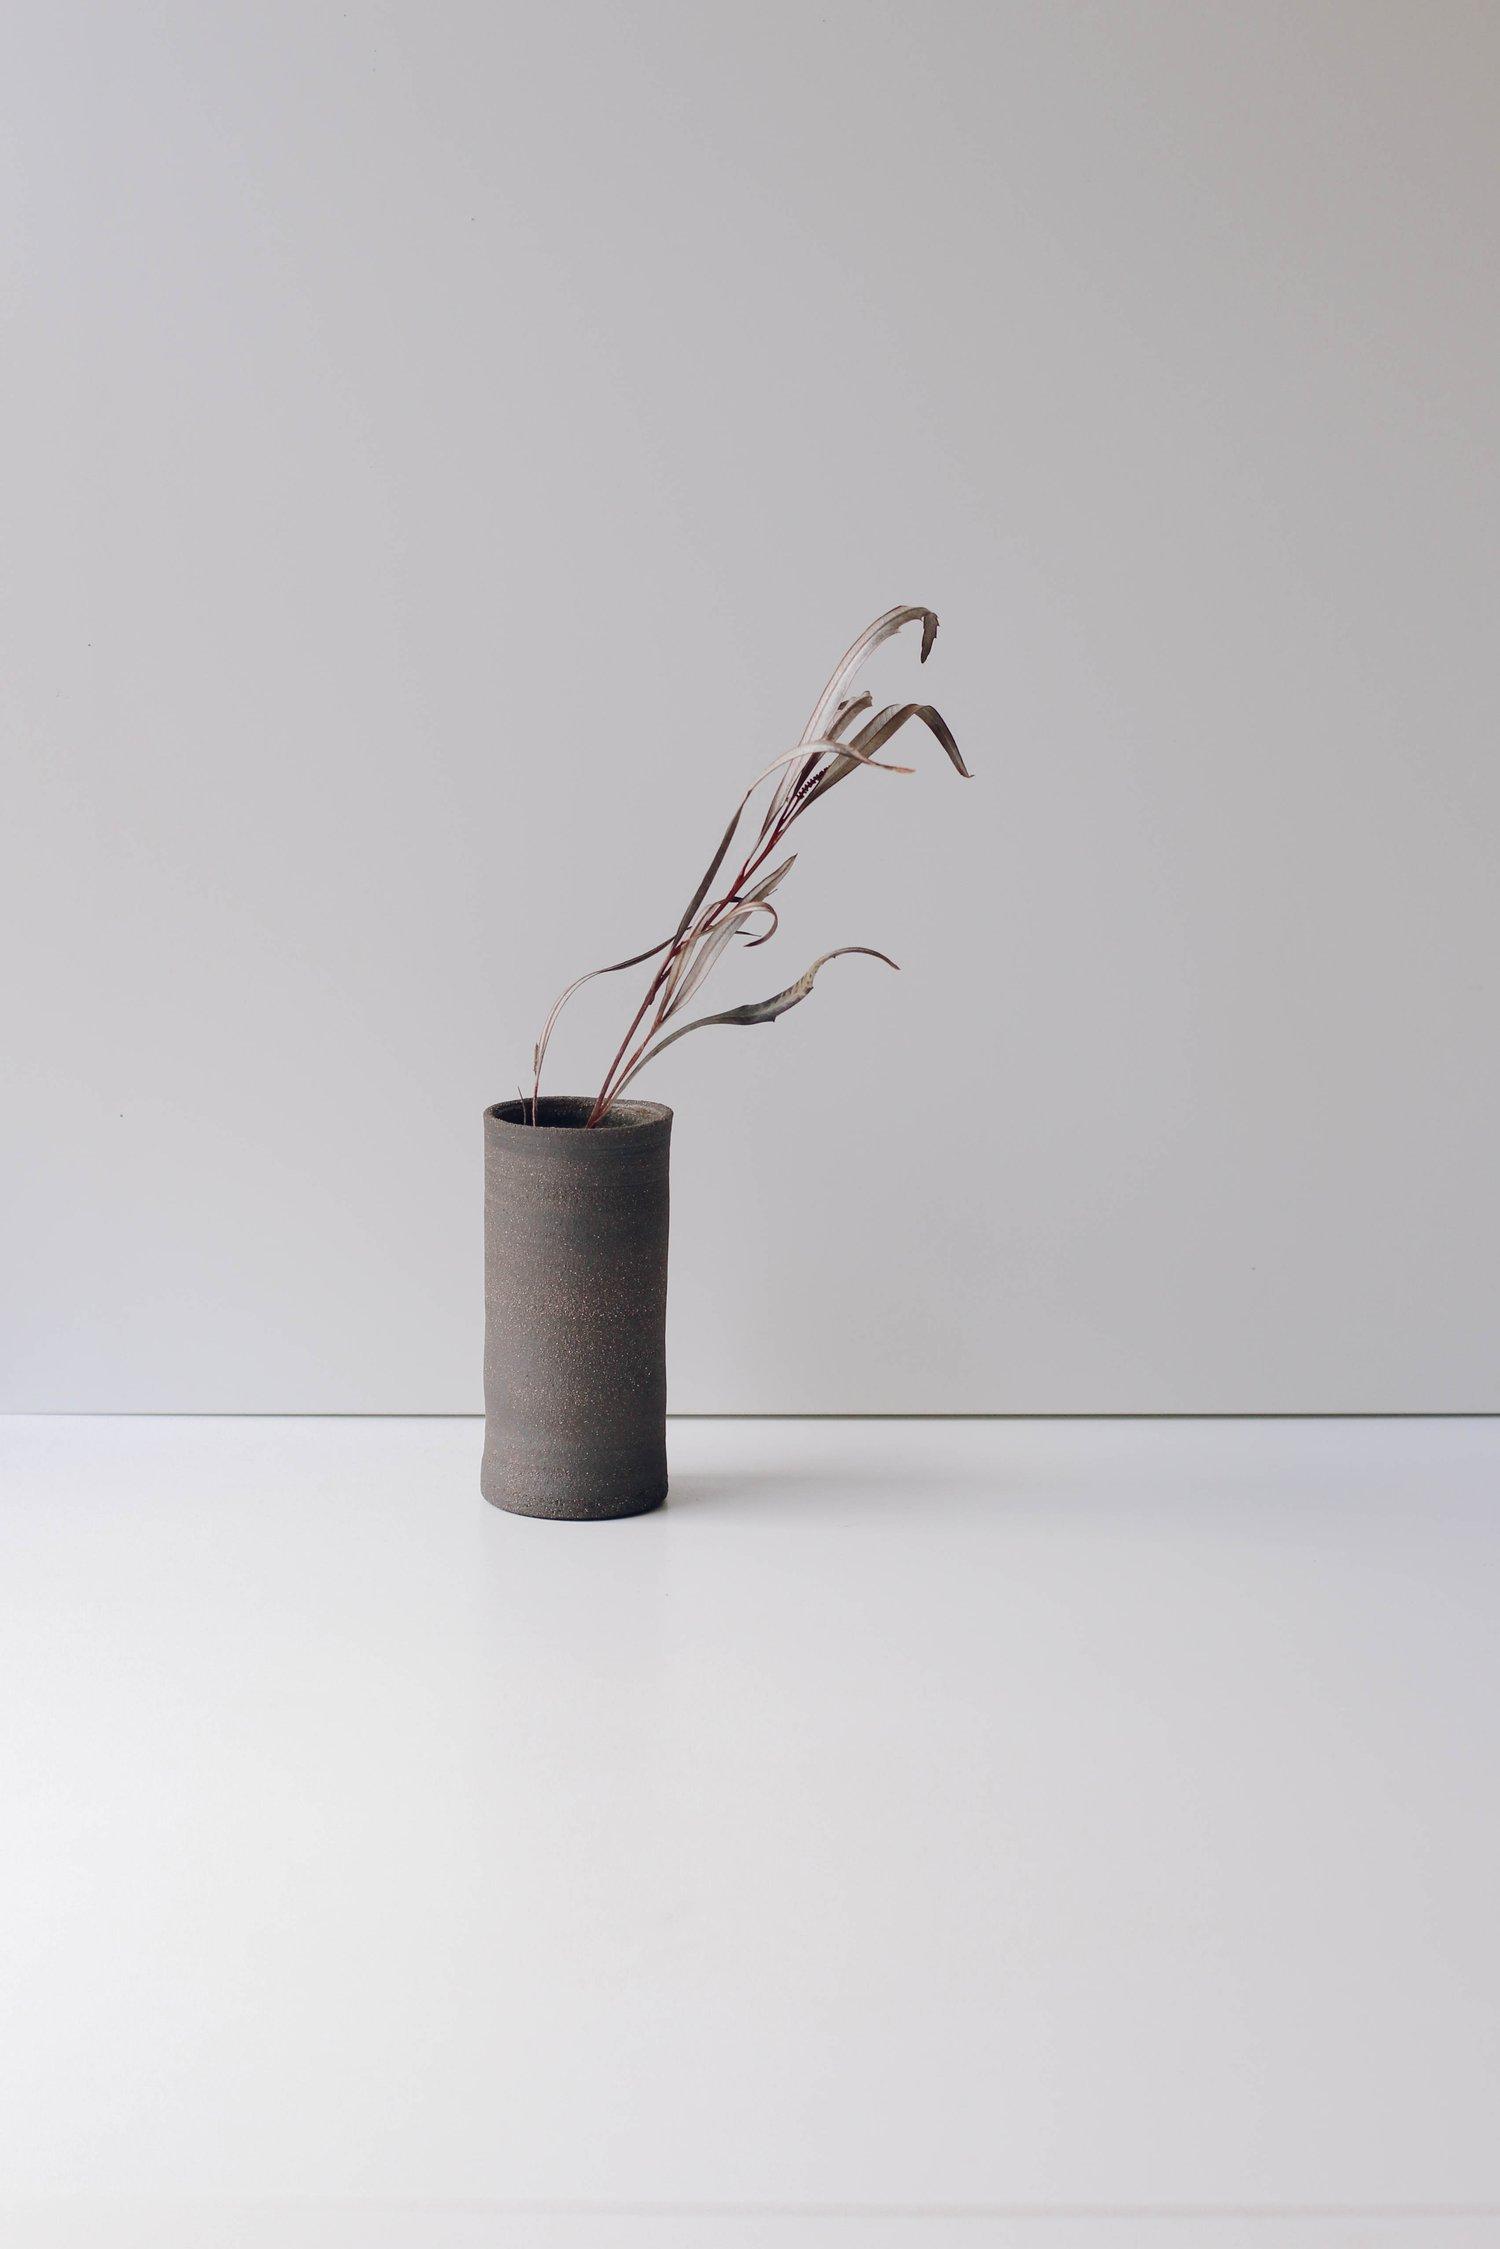 Image of Dark Vase